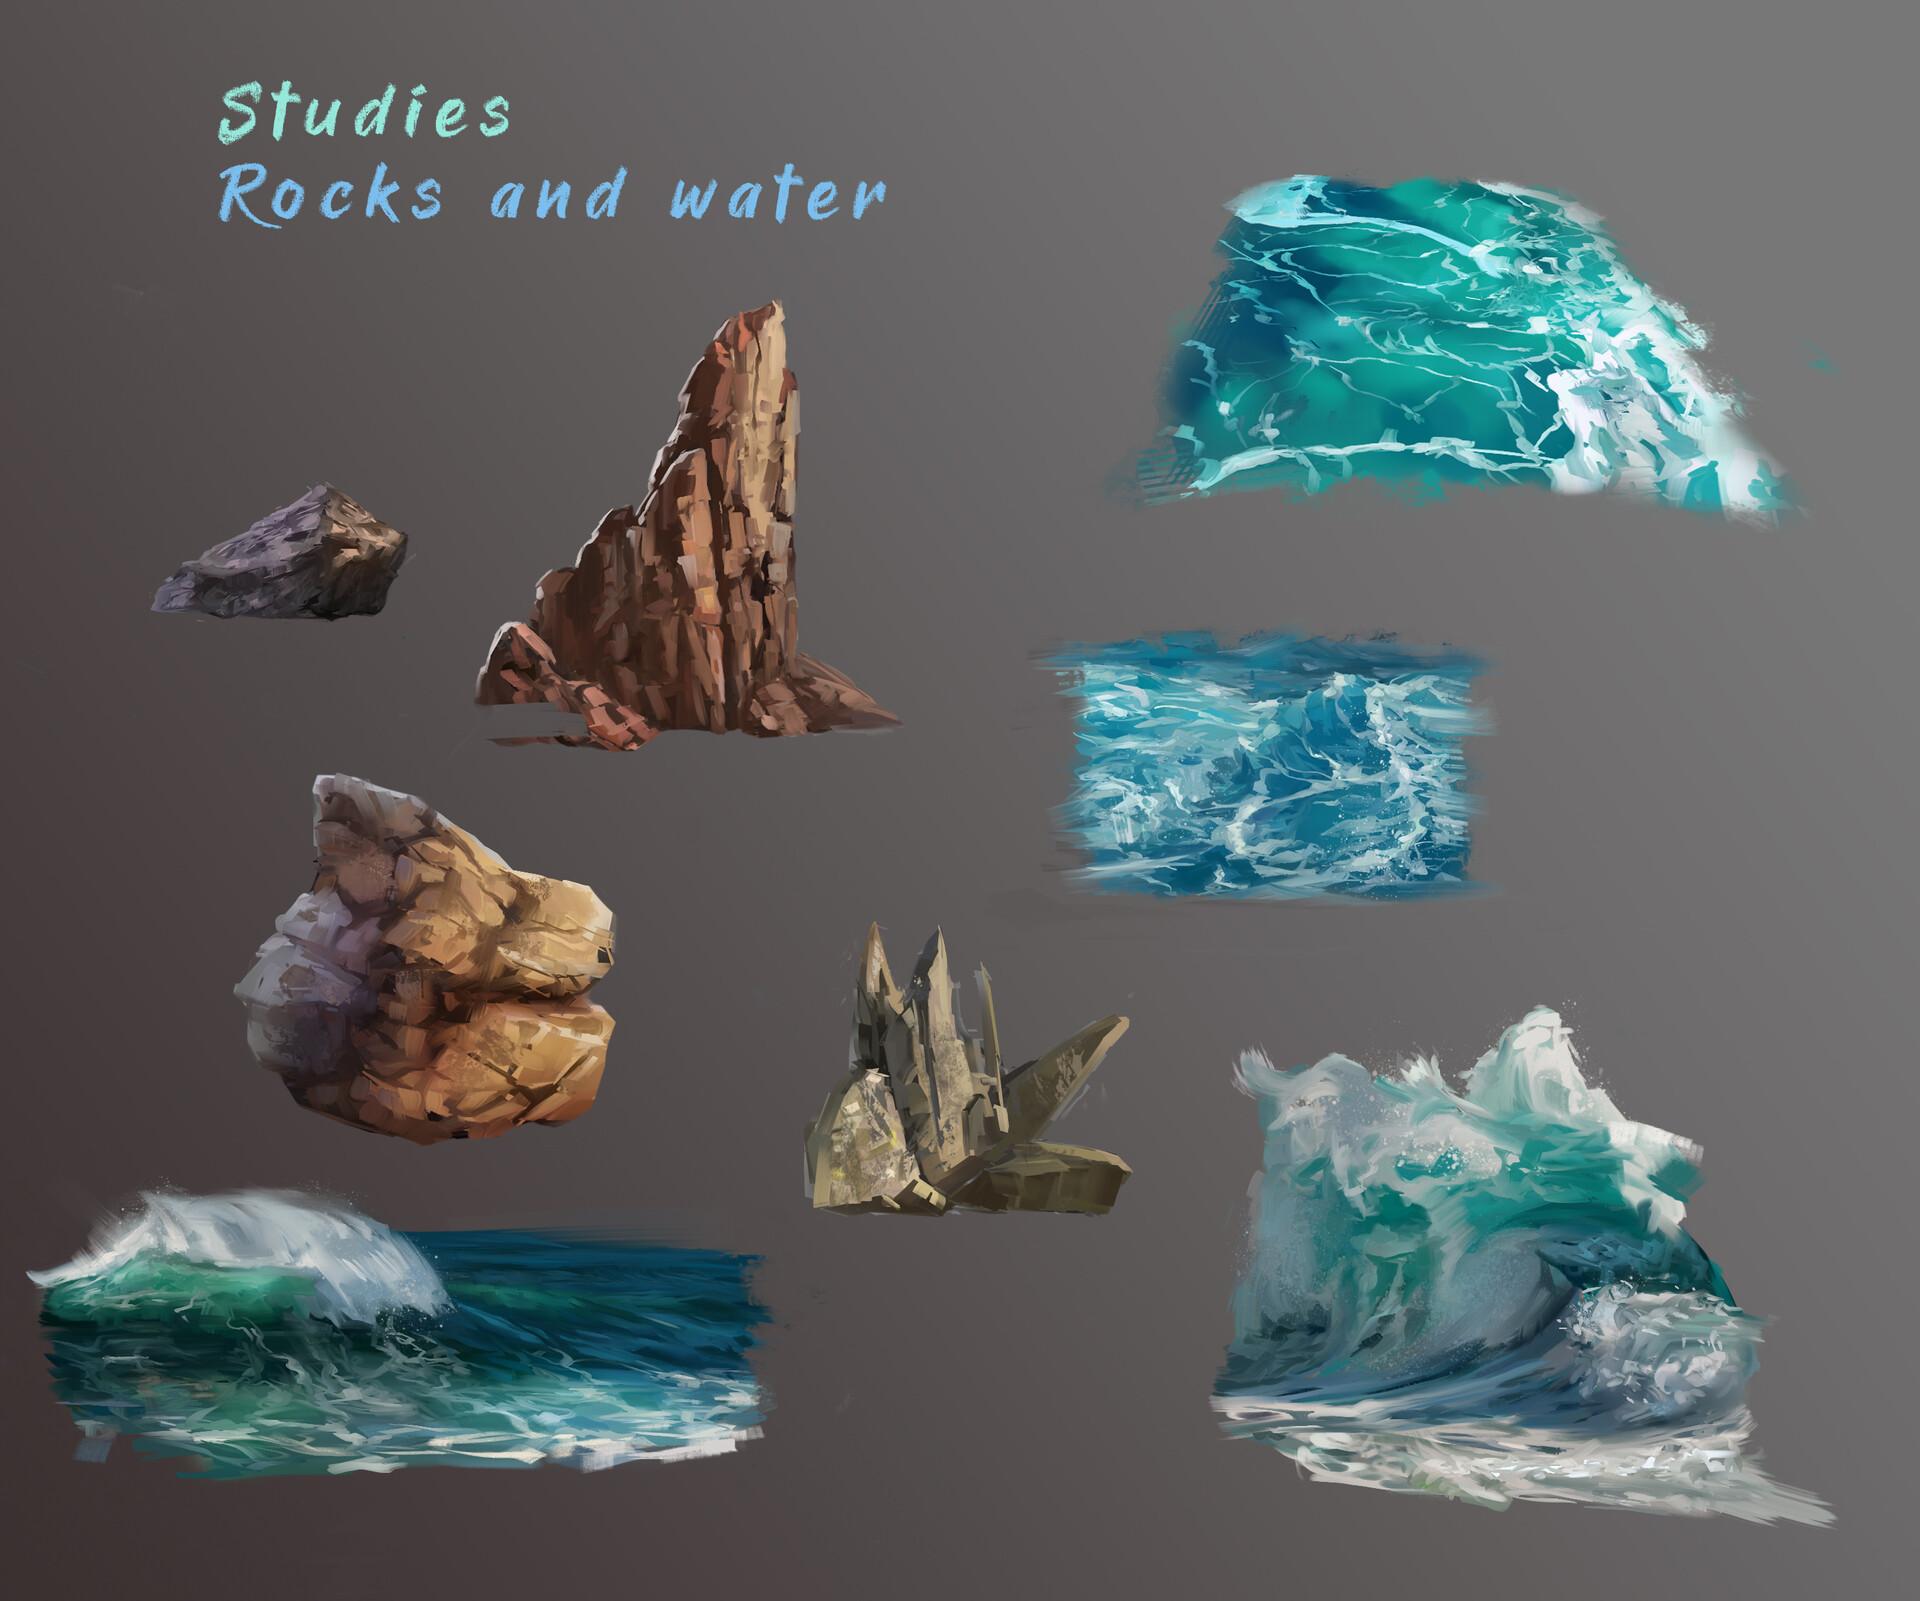 Mj venegas spadafora studies rocks and water